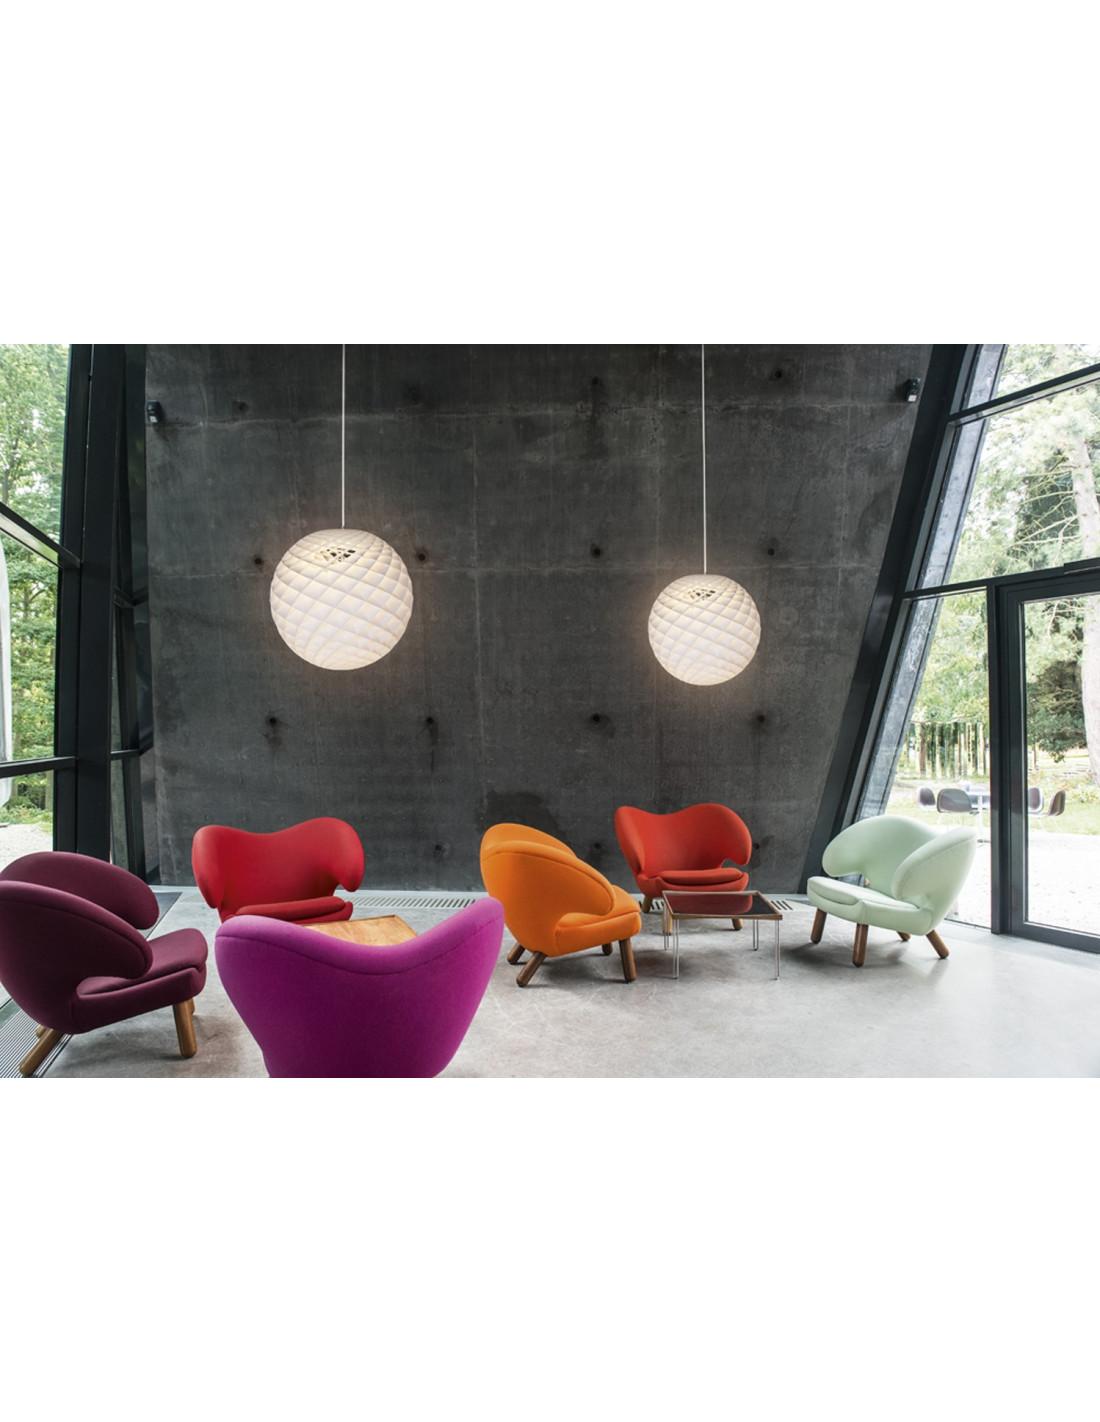 pendant patera oivind slaatto louis poulsen. Black Bedroom Furniture Sets. Home Design Ideas